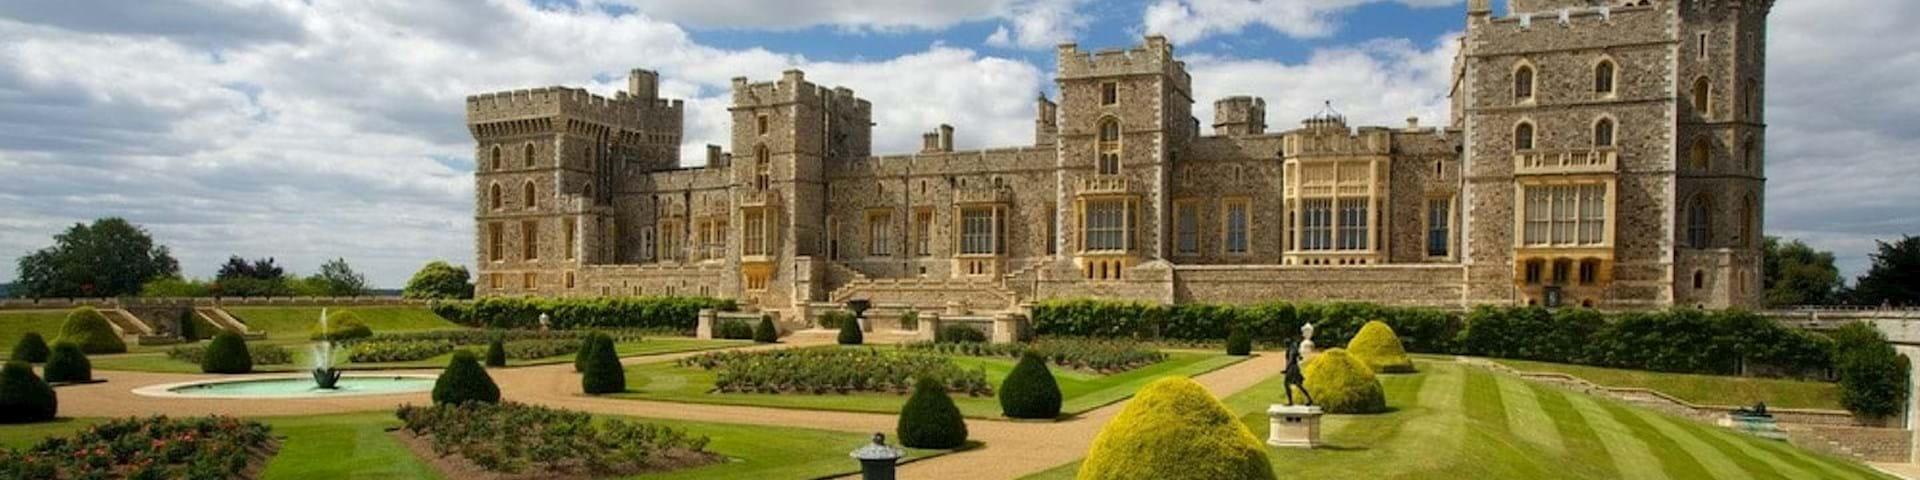 Windsor Castle Tours